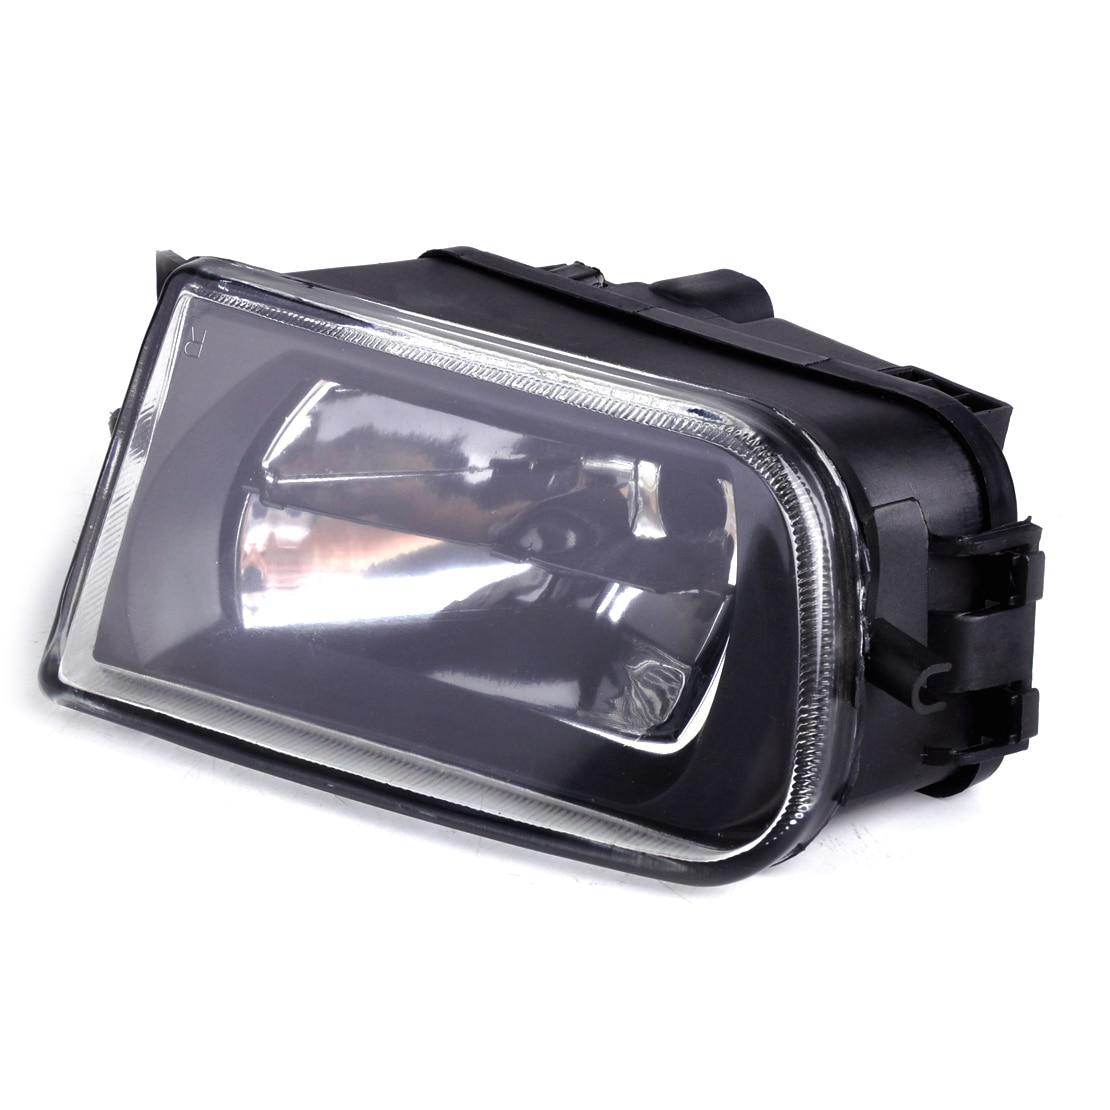 beler 63178360576 1Pc Right Fog Light Bumper Lamp 12V 55W Fit for BMW E36 Z3 E39 5 Series 528i 540i 535i 1997 1998 1999 2000 в поисках священного по святым местам россии комплект из 2 книг